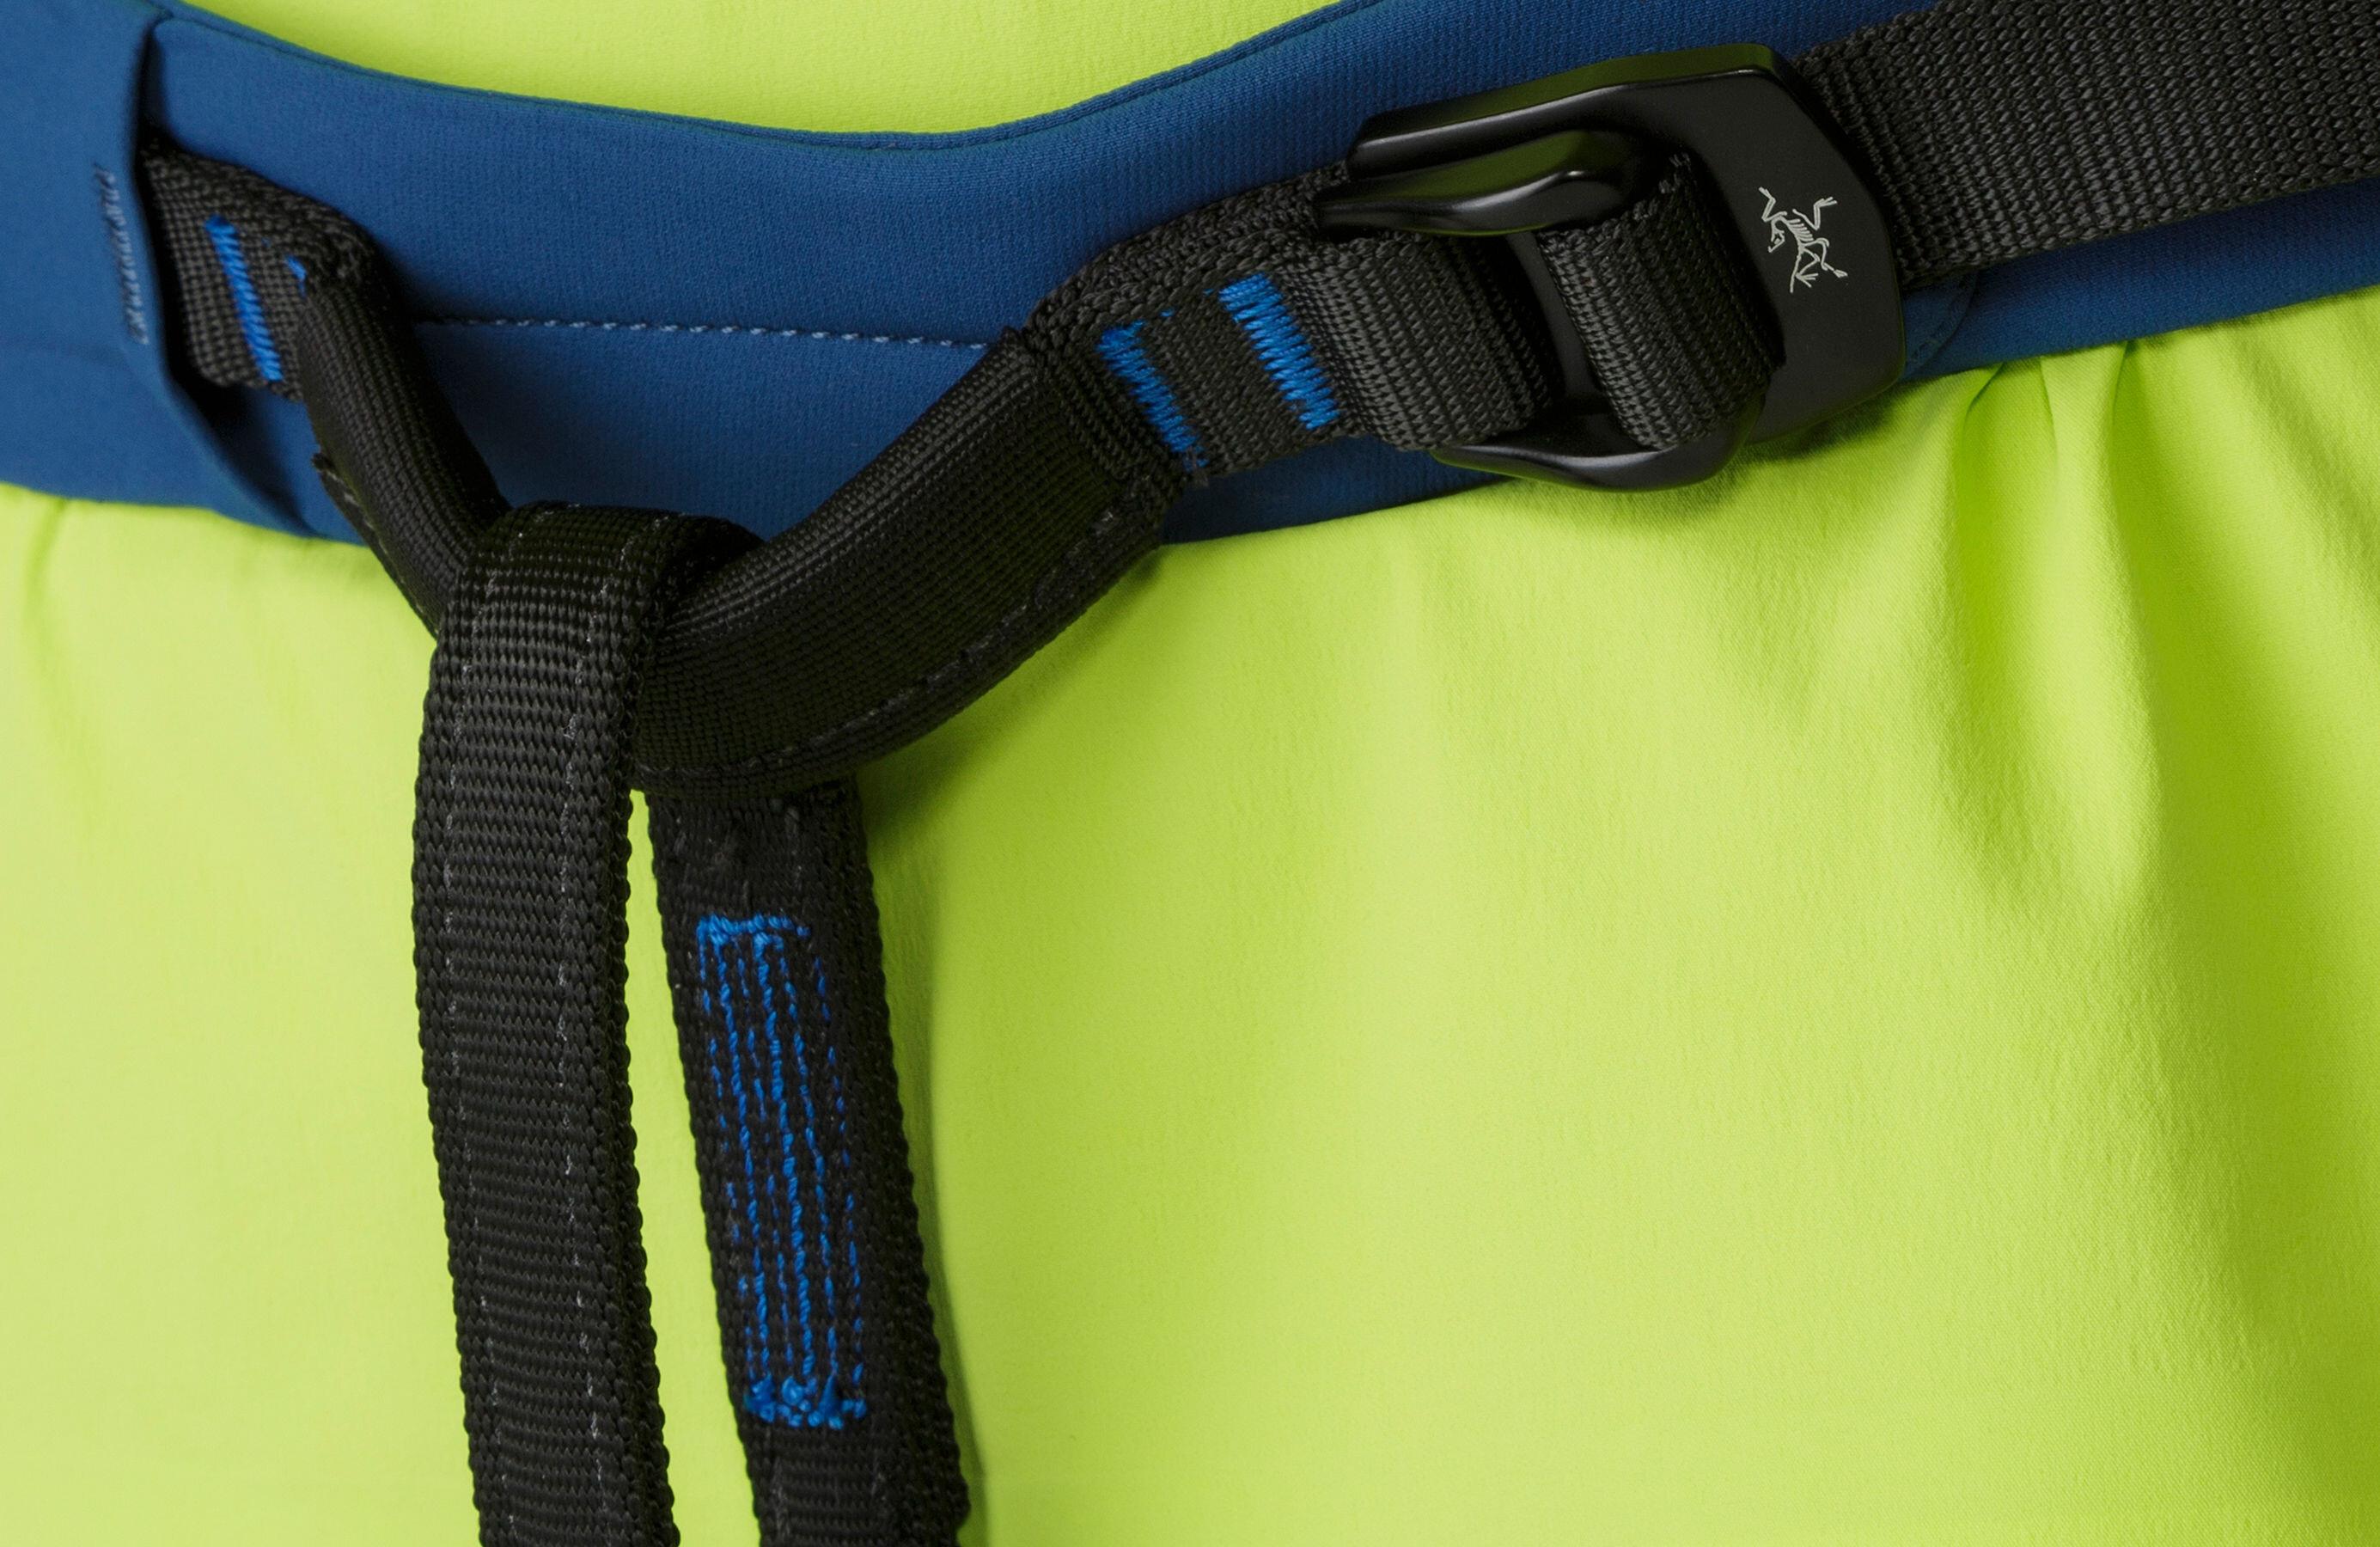 Skylotec Klettergurt Unterschied : Arcteryx fl 355 harness women poseidon titanite campz.de